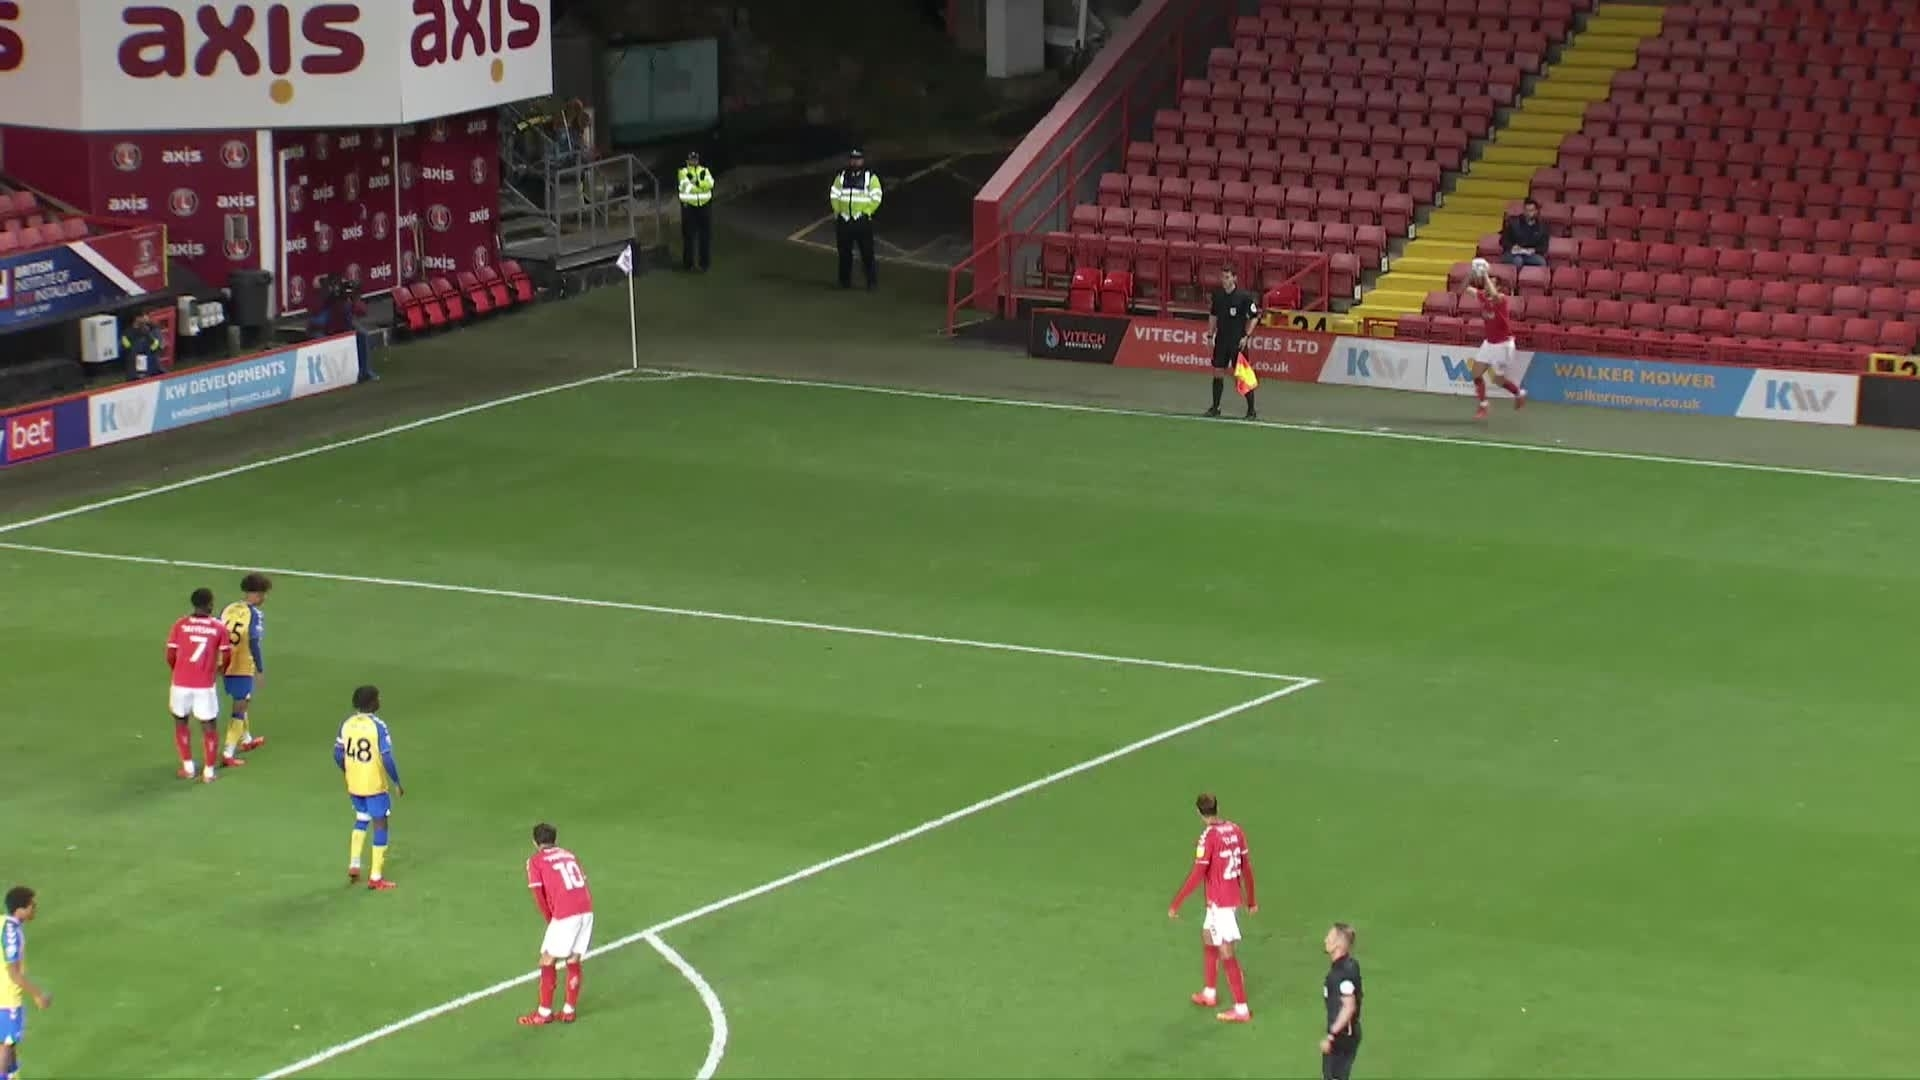 HIGHLIGHTS   Charlton 4 Southampton U21 1 (October 2021)